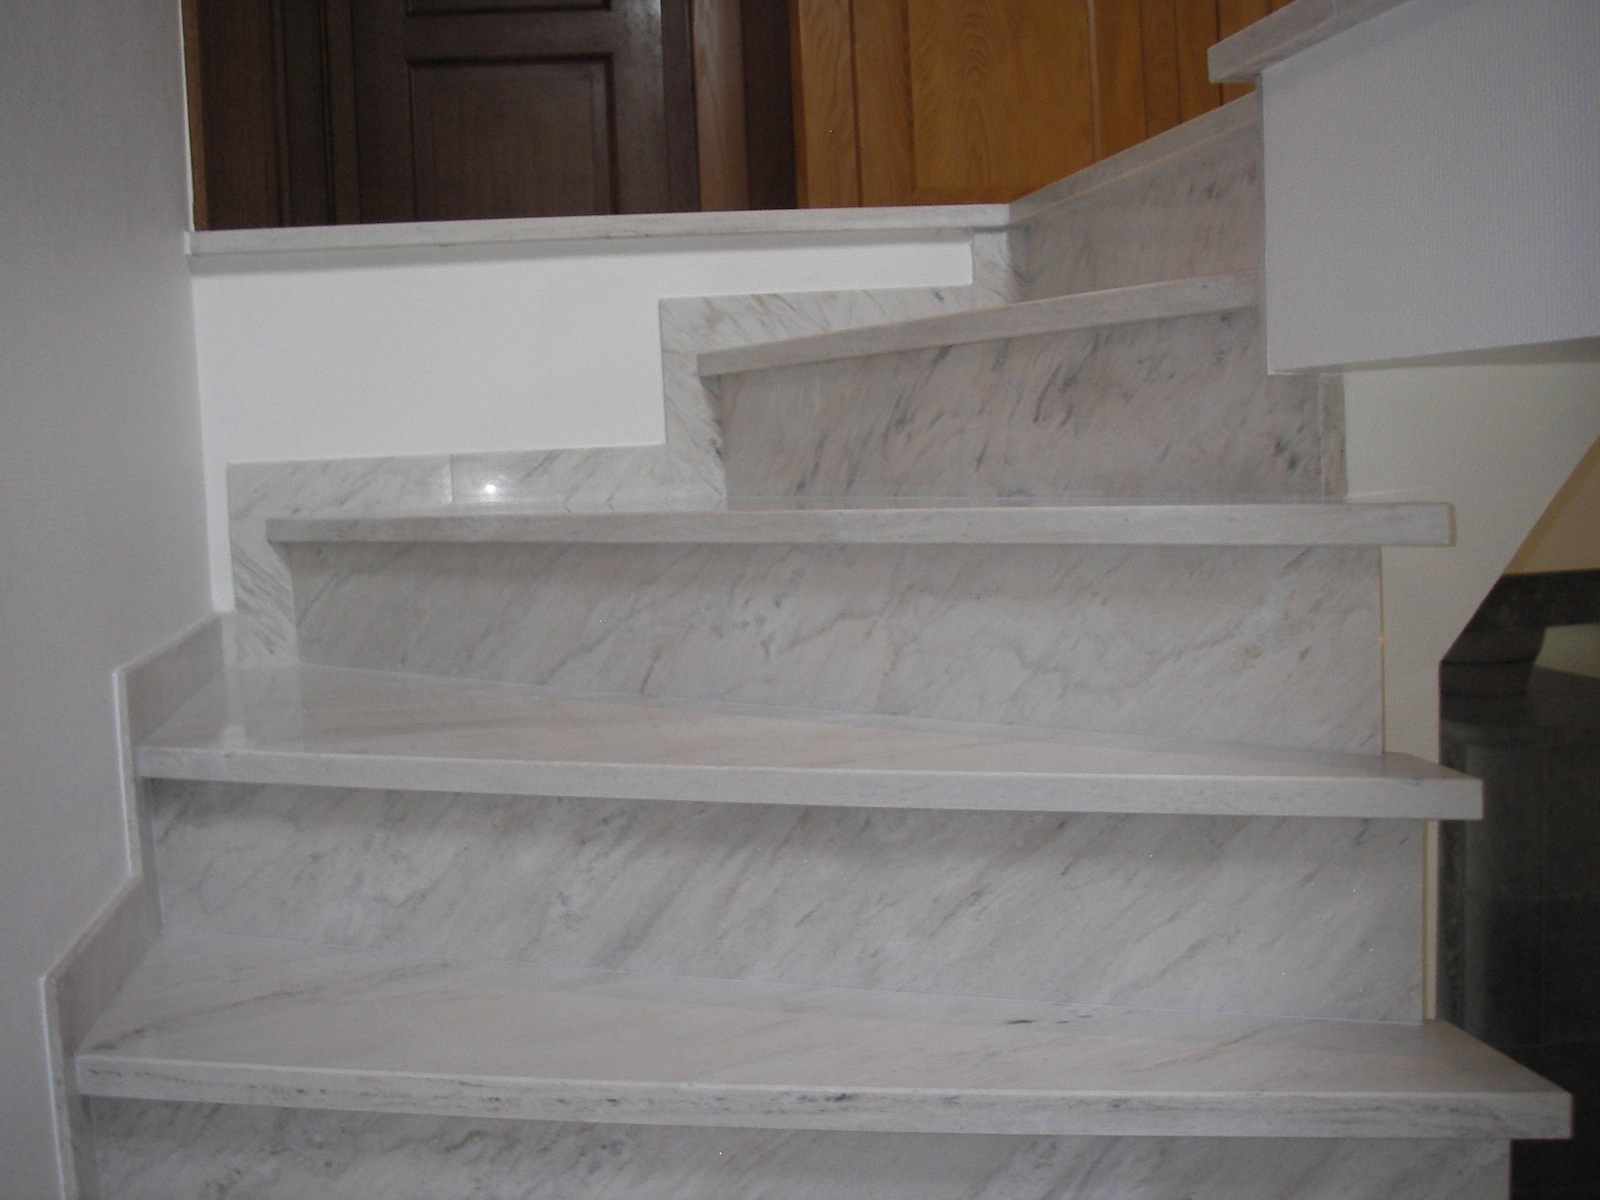 escalier travertin interieur id e inspirante pour la conception de la maison. Black Bedroom Furniture Sets. Home Design Ideas